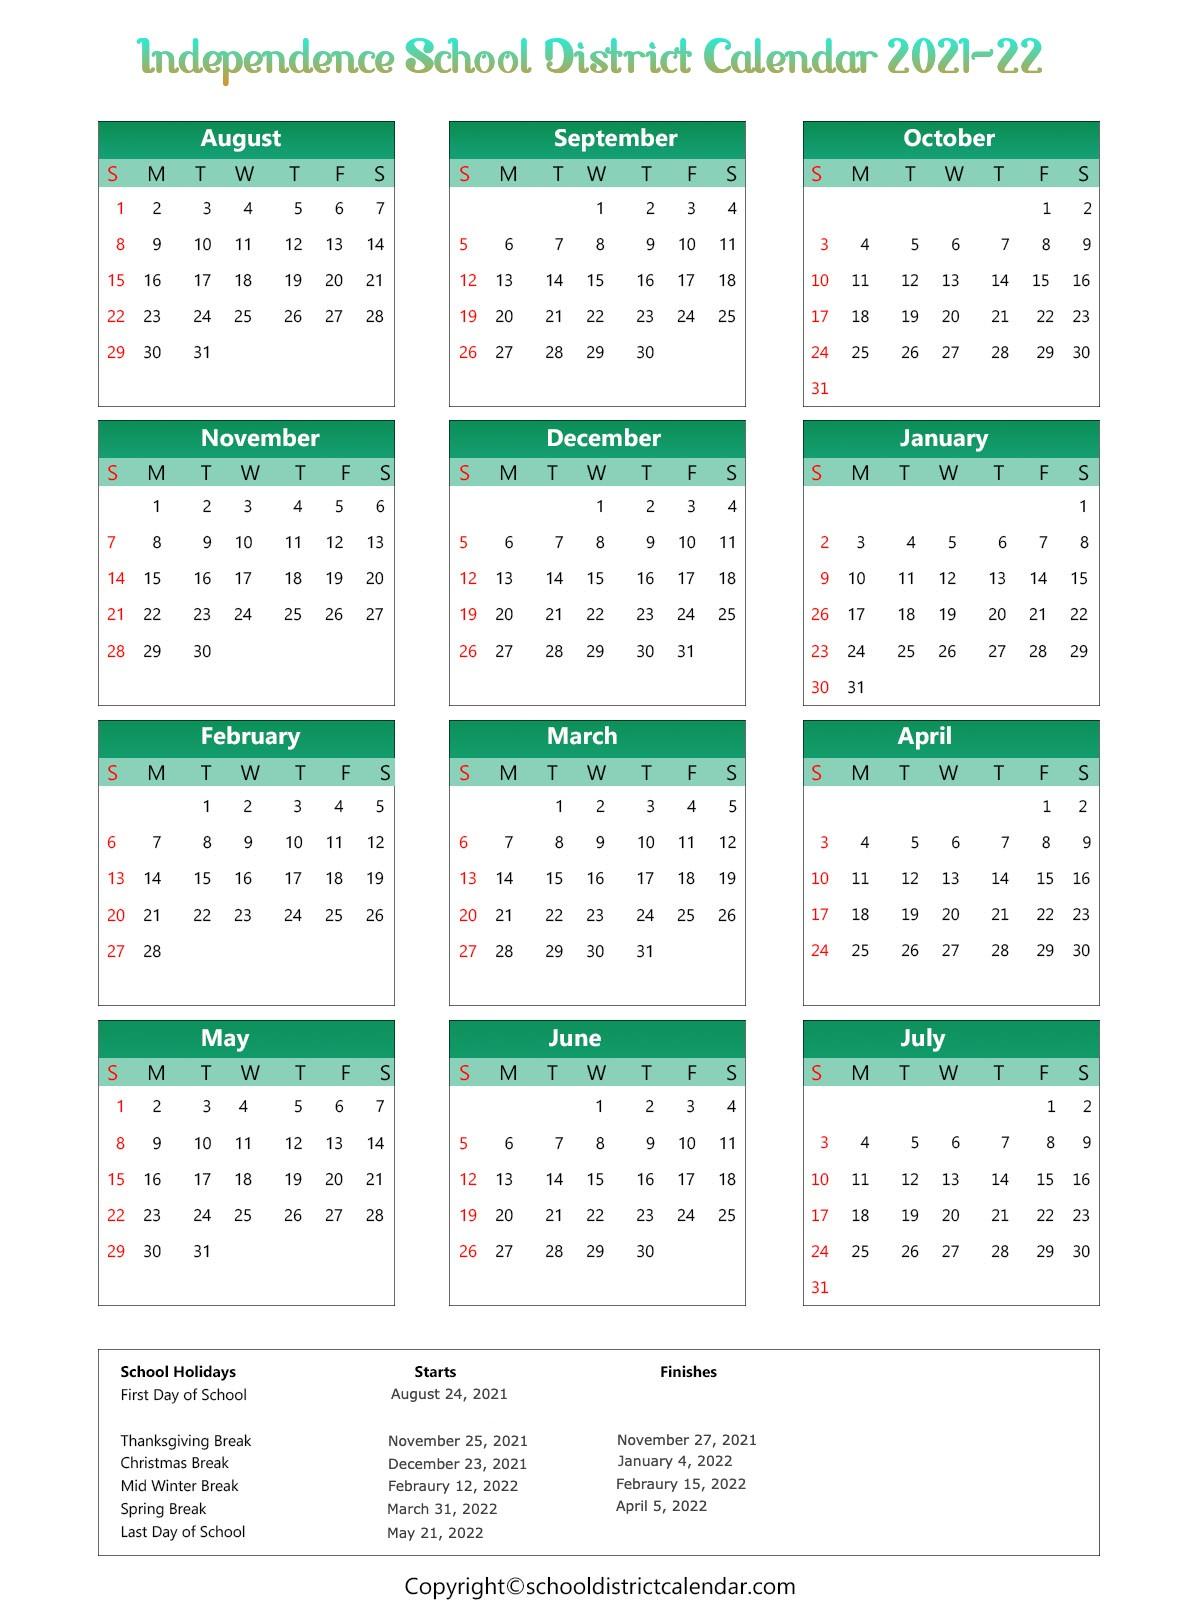 Independence School District Calendar 2021-22